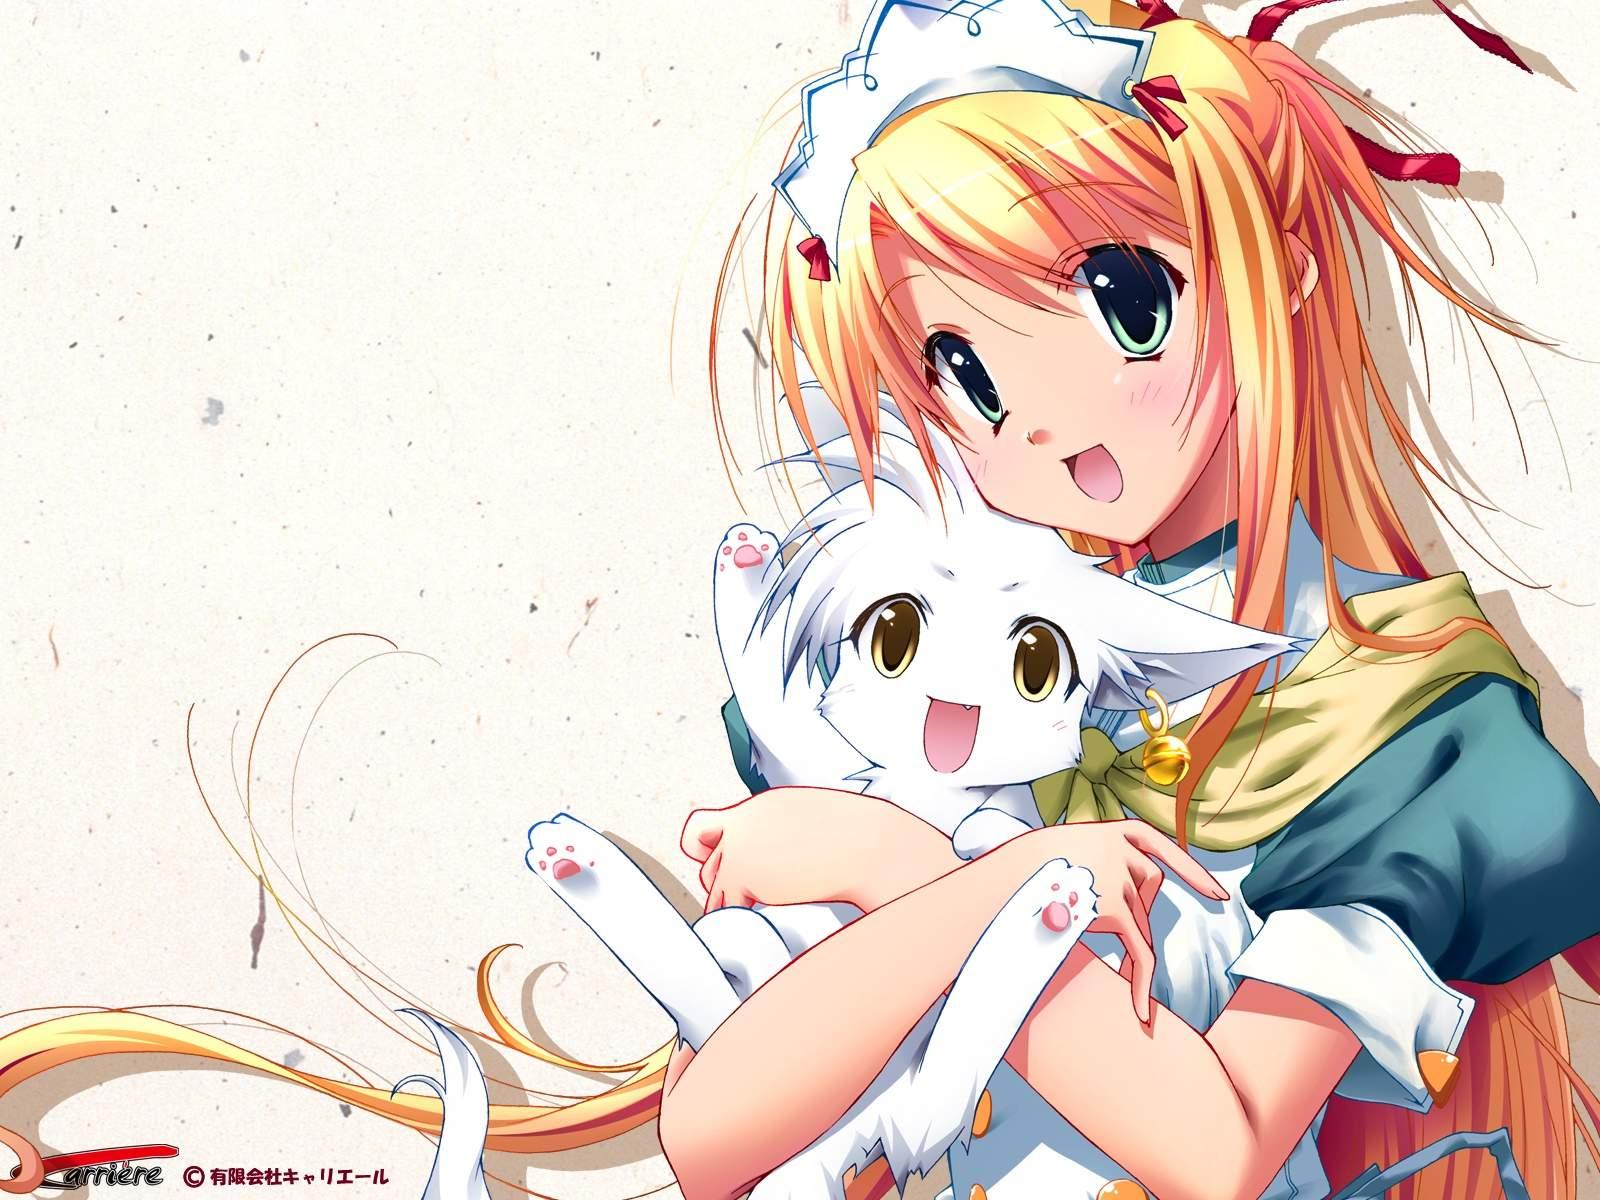 animal blonde_hair carriere fox green_eyes headdress koma_(carriere) logo long_hair sorune watermark white